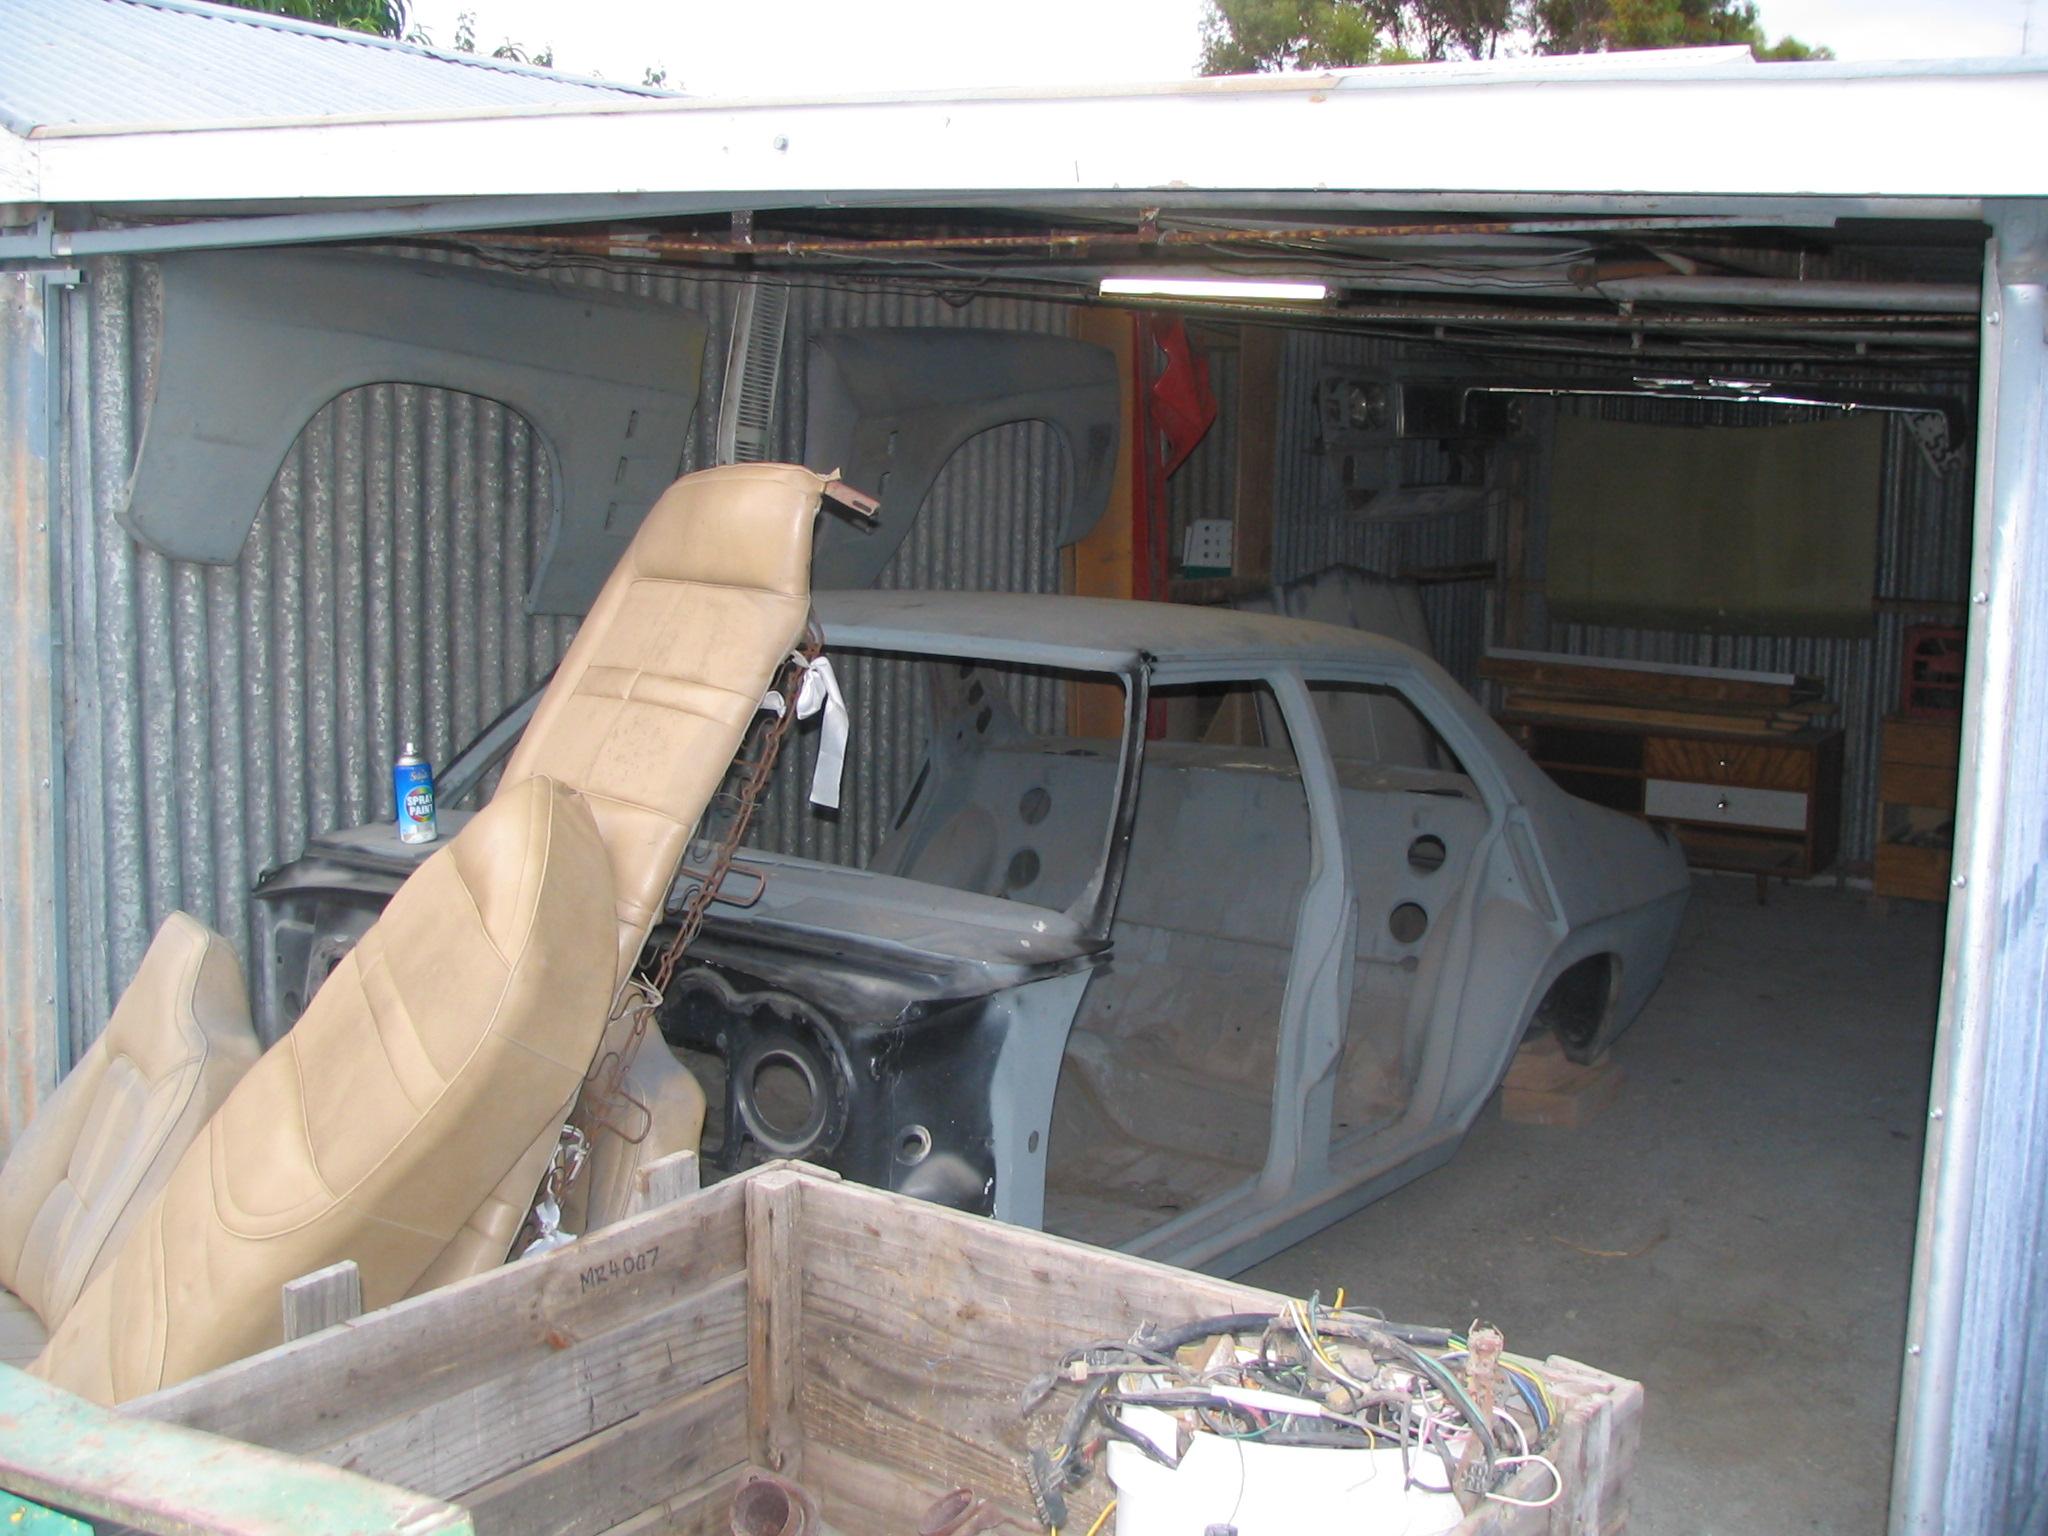 hight resolution of current trim original but all pulled apart original paint 568 30521 current paint 10year old primer original driveline l31 m41 gu4